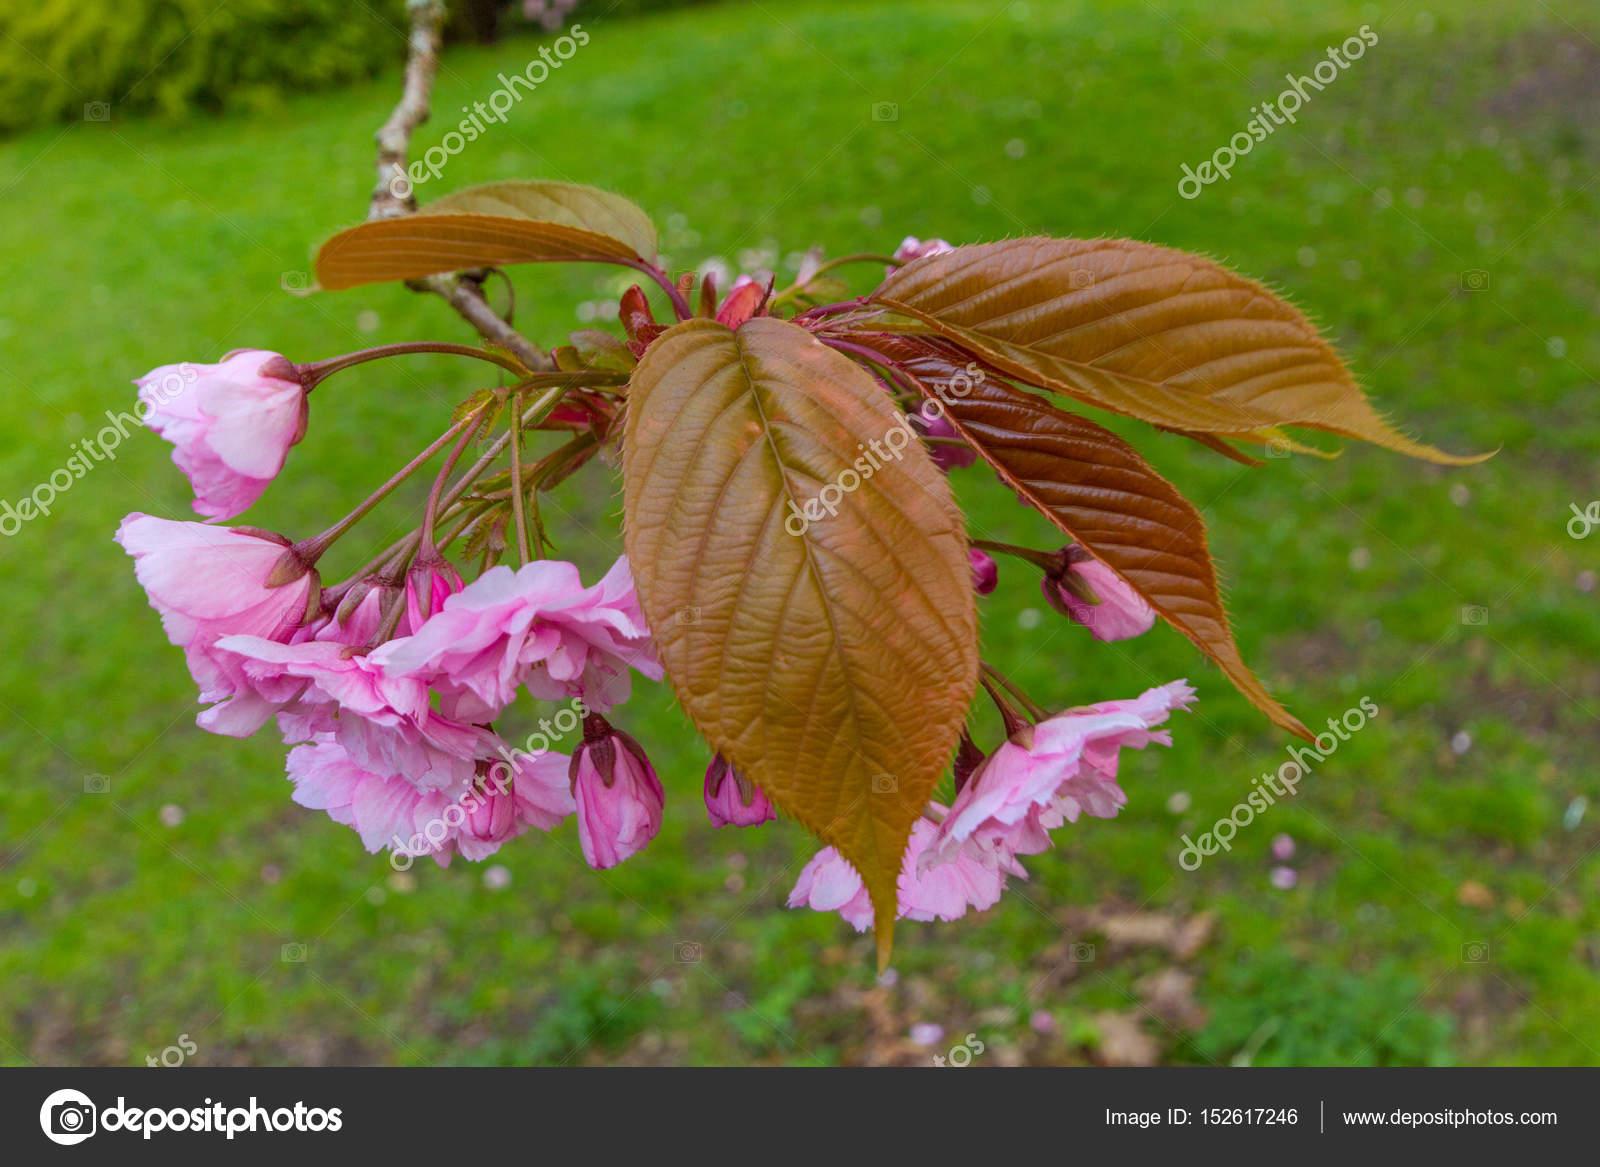 Blossoms And Leaves Of Kwanzan Cherry Tree Jesmond Dene Newcas Stock Photo Image By C Palliki 152617246